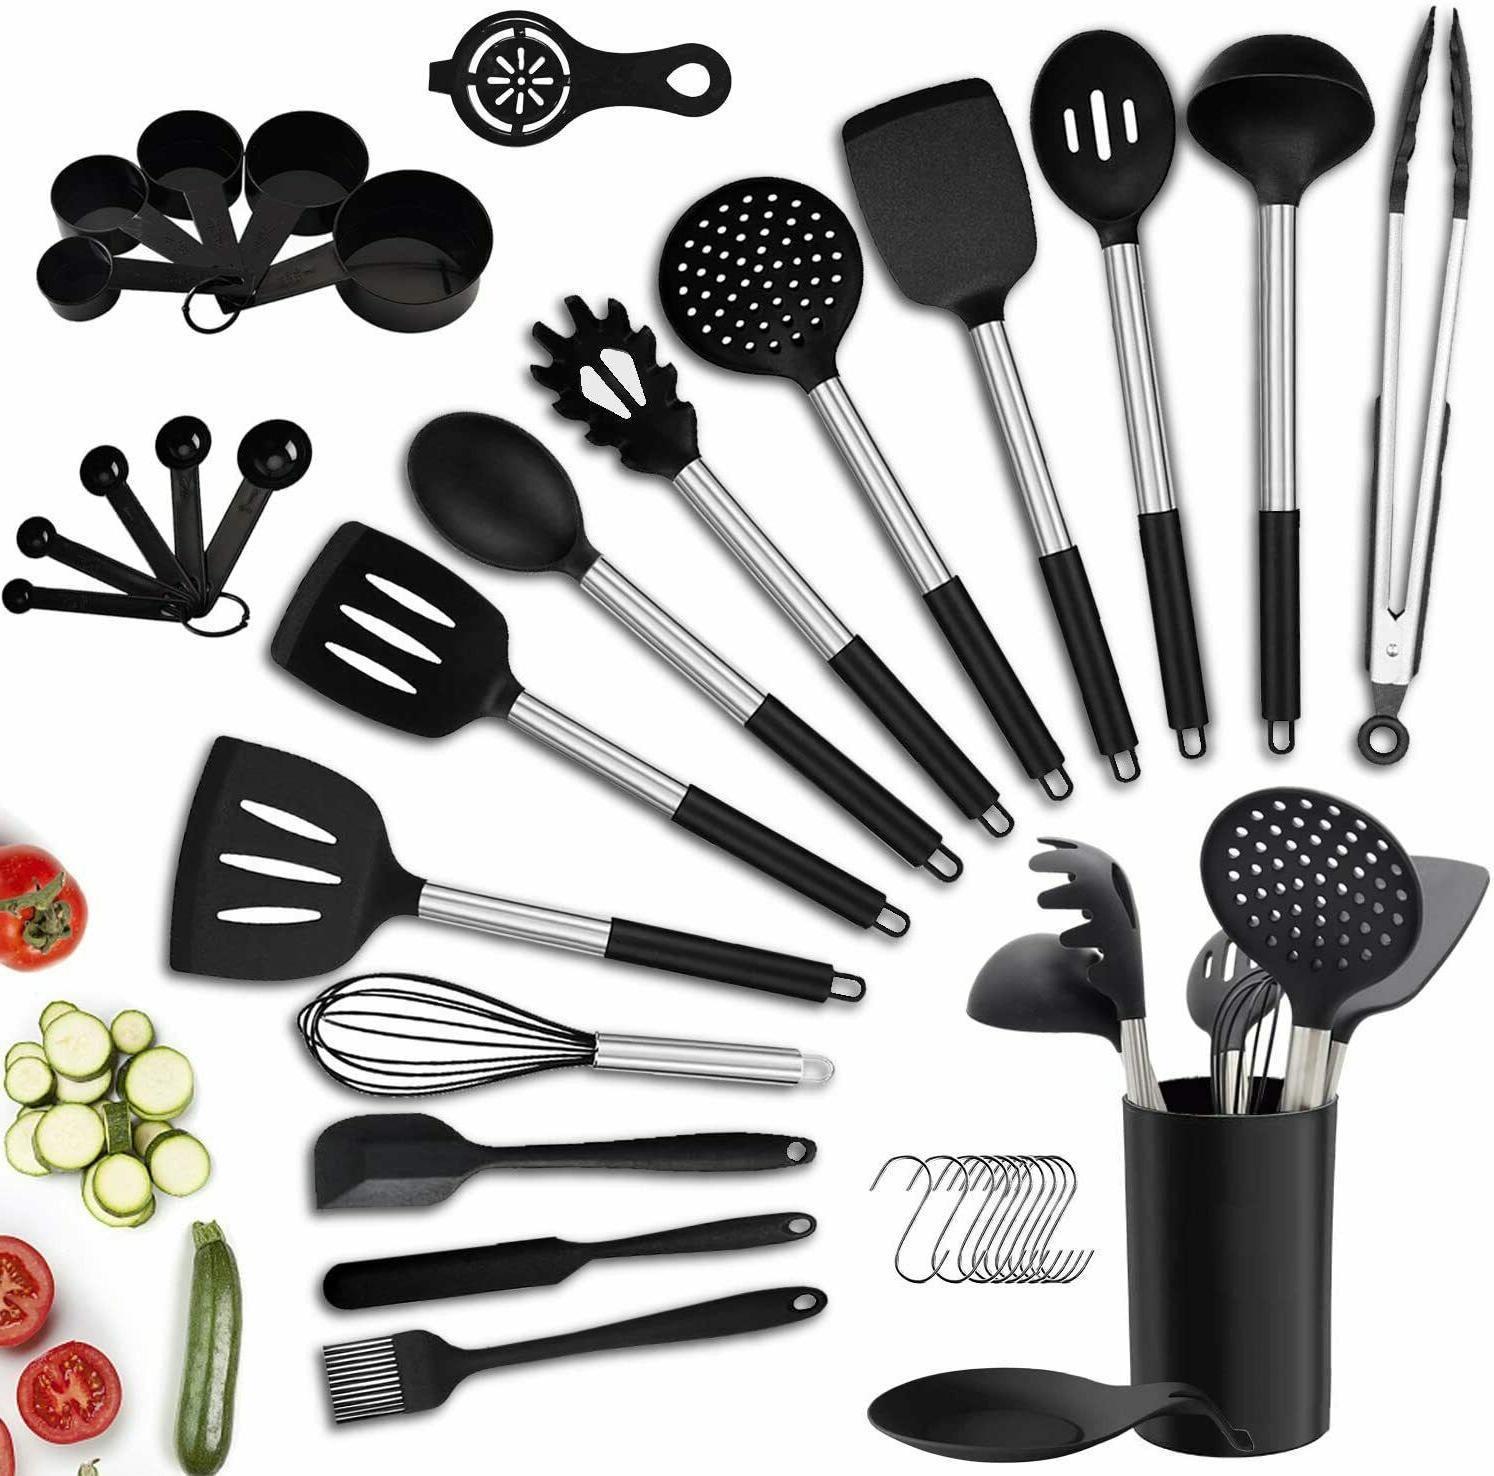 36pcs kitchen utensil set silicone cooking utensils